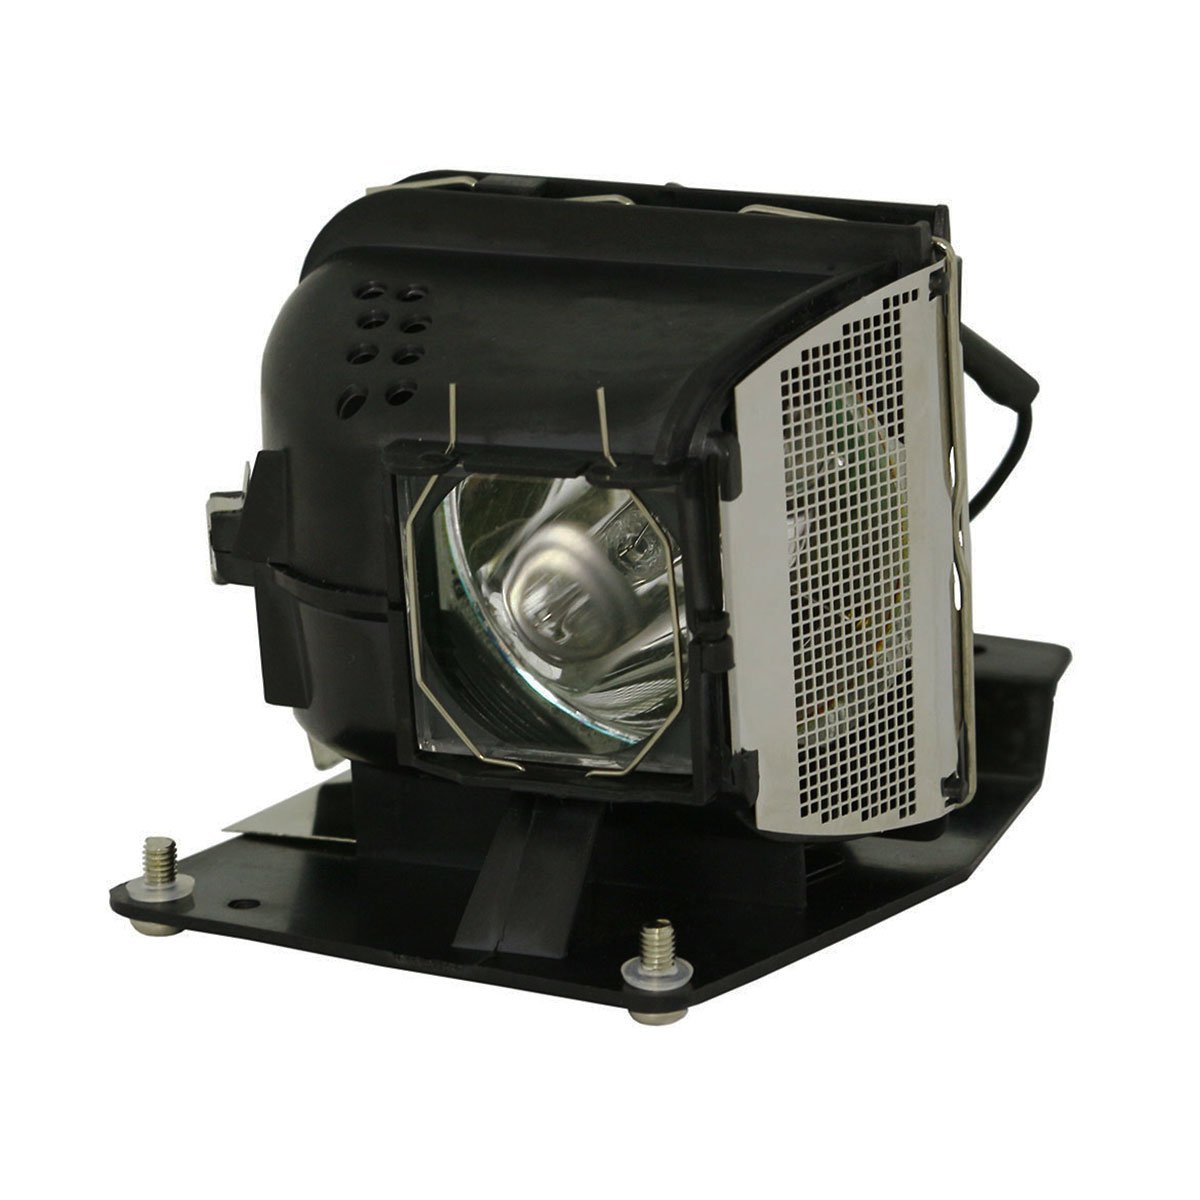 Lutema OEMプロジェクター交換用ランプ ハウジング/電球付き InFocus LP70用 Platinum (Brighter/Durable) Platinum (Brighter/Durable) Lamp with Housing B07KTLND8T